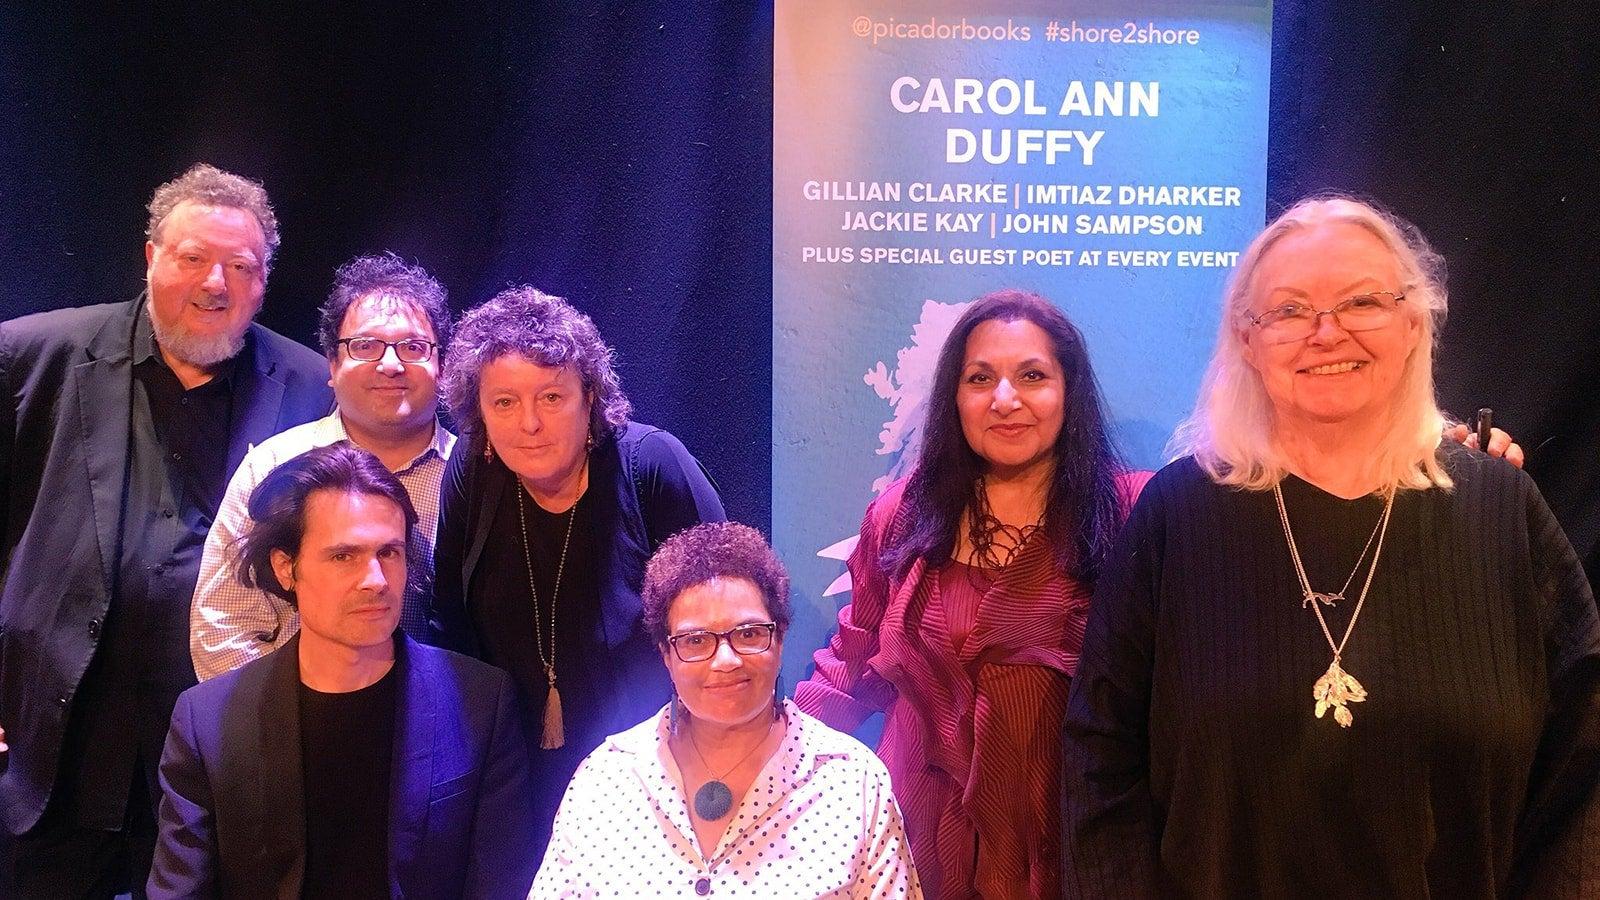 A group photo of Carol Ann Duffy, Gillian Clarke, Imtiaz Dharker, Jackie Kay and John Sampson